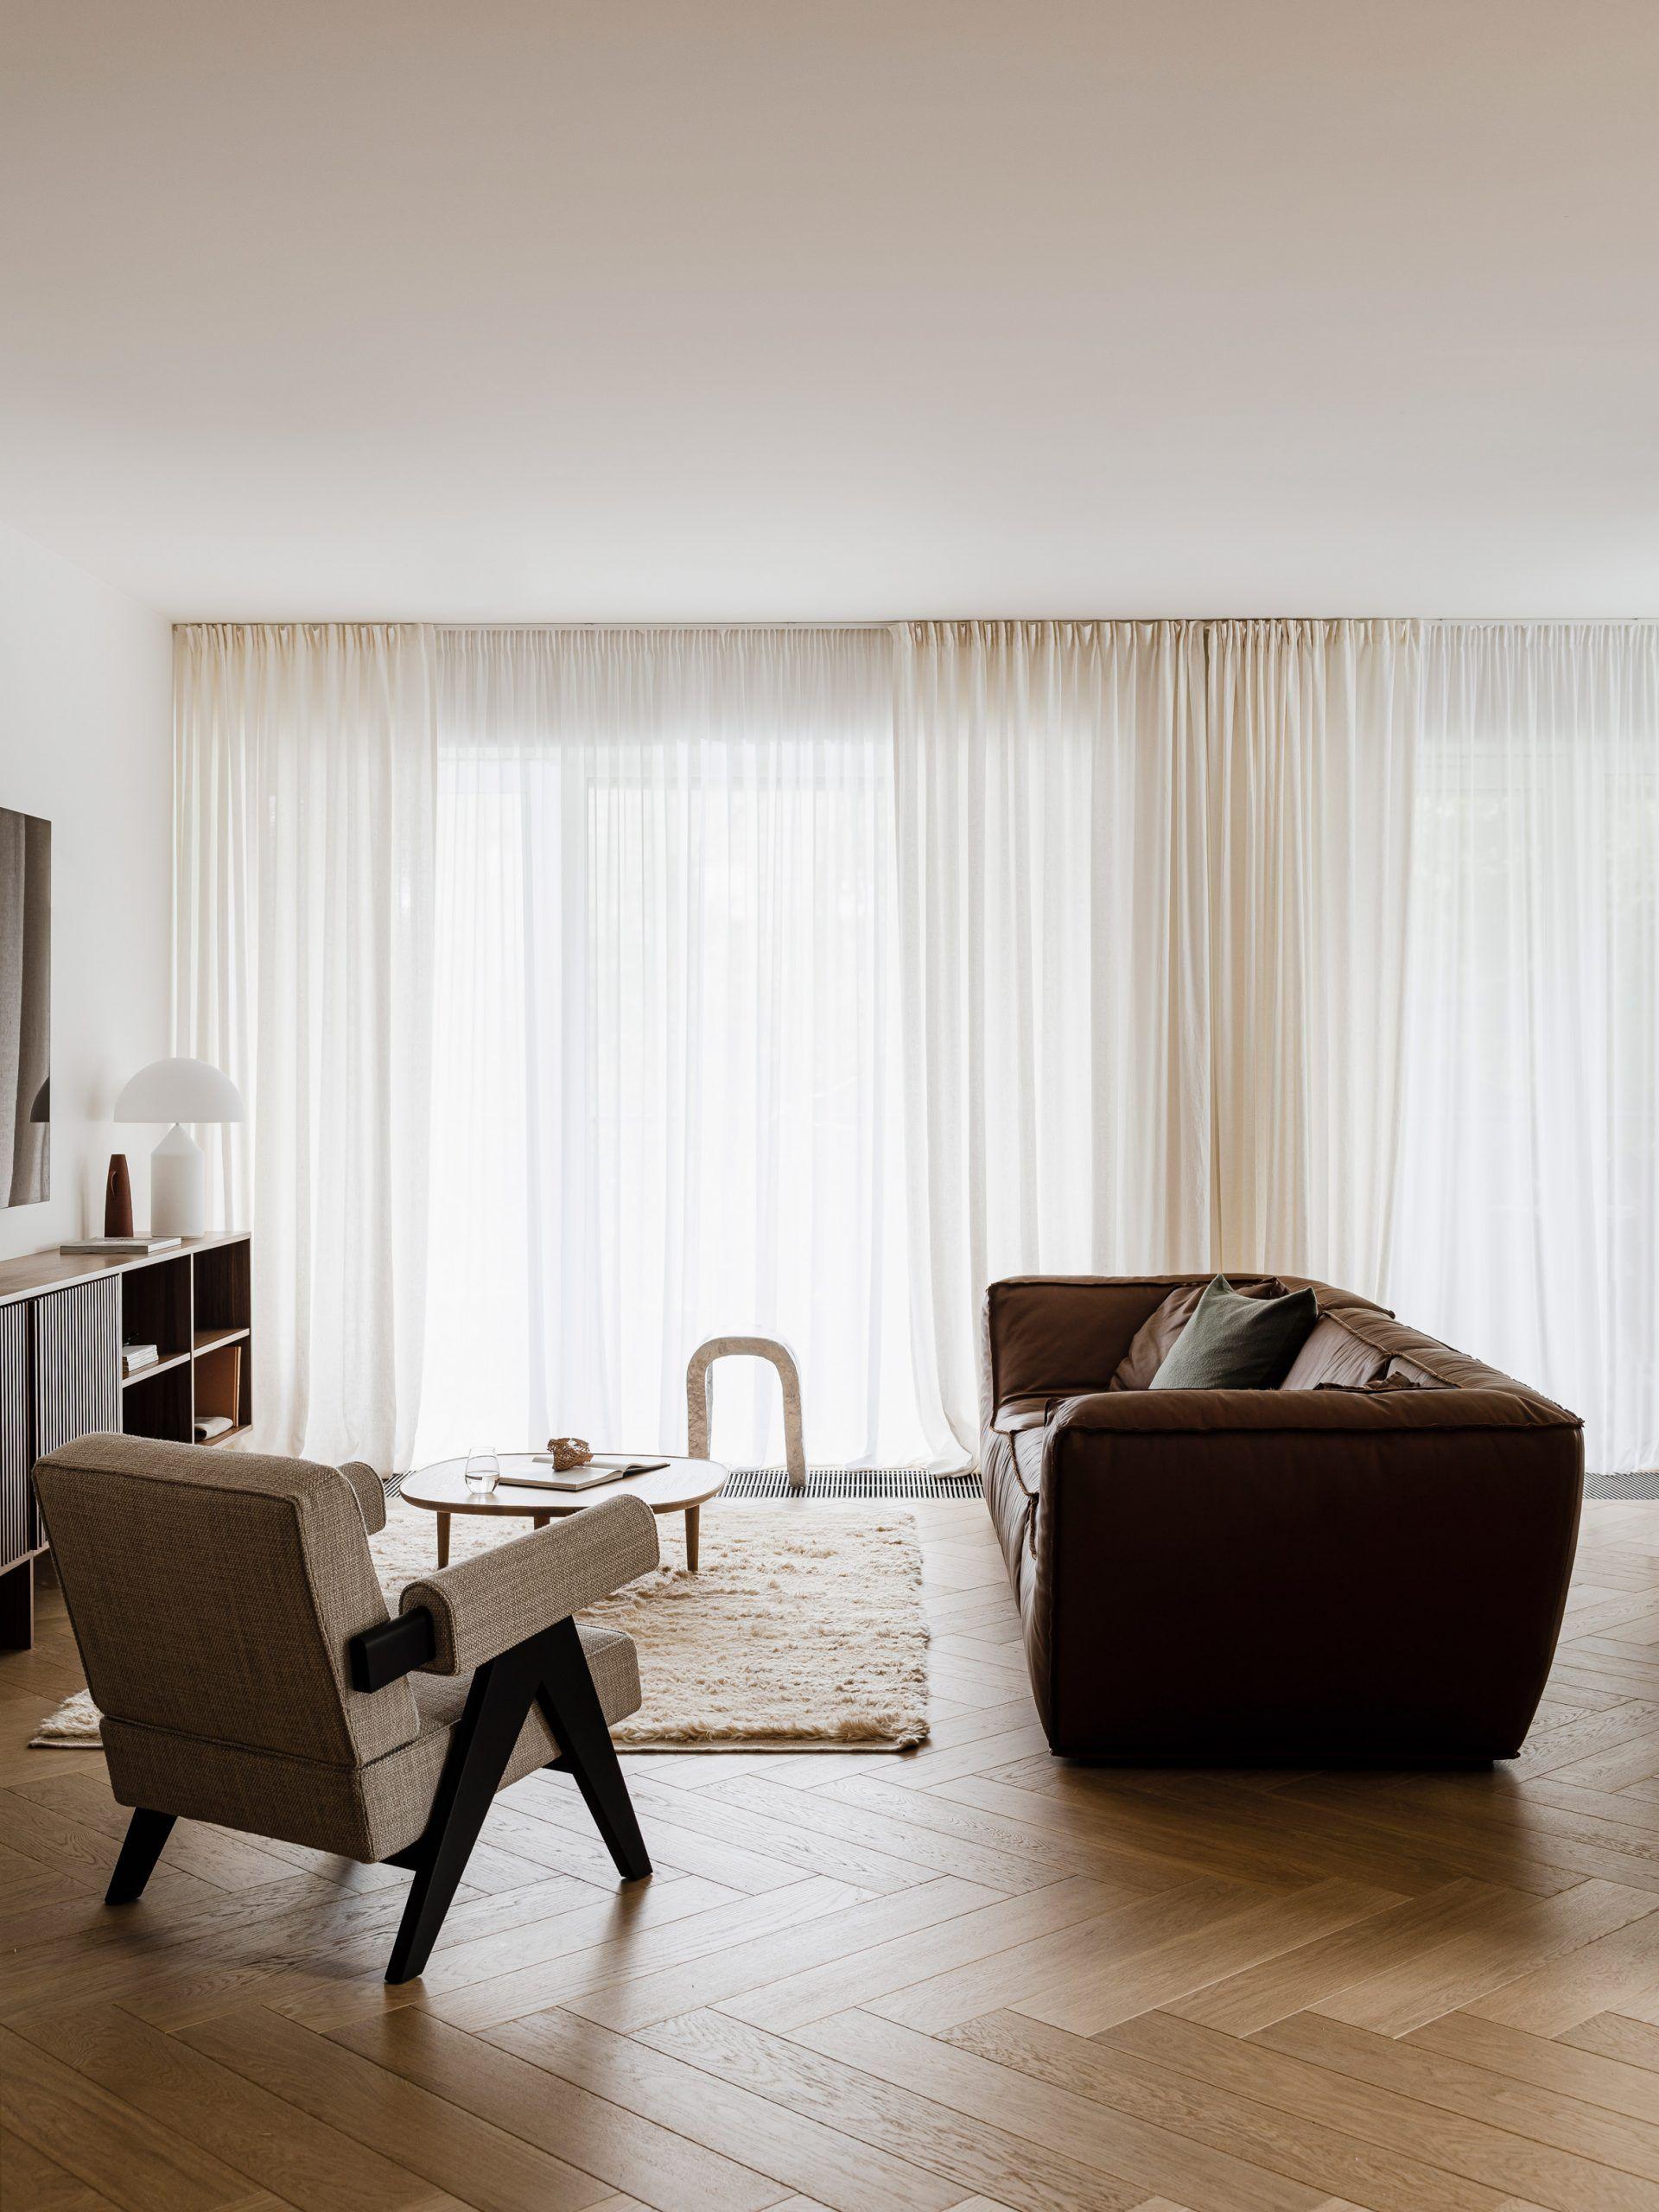 A serene space with the Easy Lounge Sofa Inspiration via #dwell #pierrejeanneret #pierrejeanneretdesign #chandigarhmasterplan #design #interiorarchitecture #1950sdesign #midcenturyfurniture #iconicfurniture #chandigarhdesign #pierrejeanneretfurniture #handmadefurniture #inspiringdesign #interiordesign #interiors #interiorinspiration #midcenturymodern #midcenturymoderndesign #midcenturyfurniture #interiordaily #moderninterior #designdaily